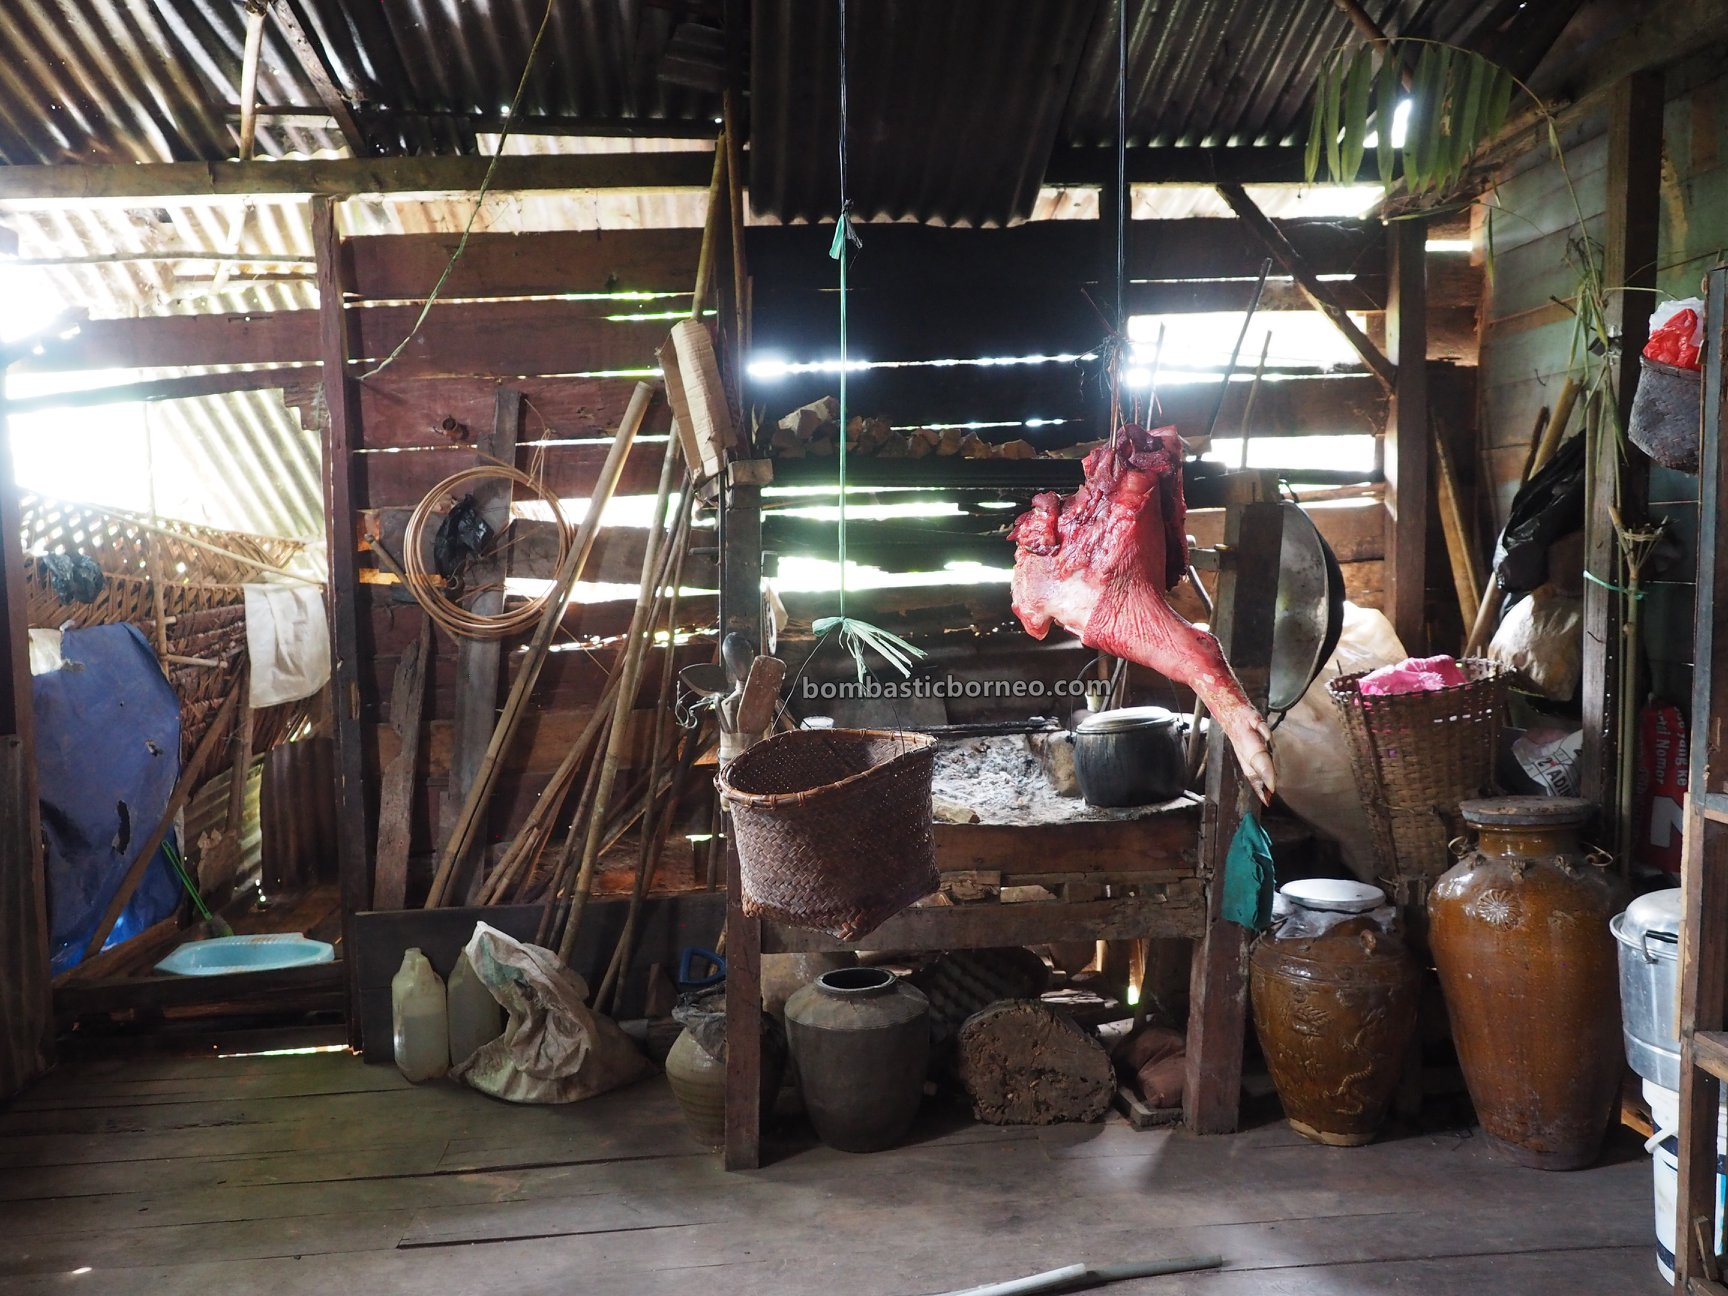 Desa Tamong, adventure, backpackers, culture, exploration, Gawai Padi, Kalimantan Barat, Siding, ethnic, native, Dayak Bidayuh, tribal, travel guide, 印尼西加里曼丹, 孟加映土著部落